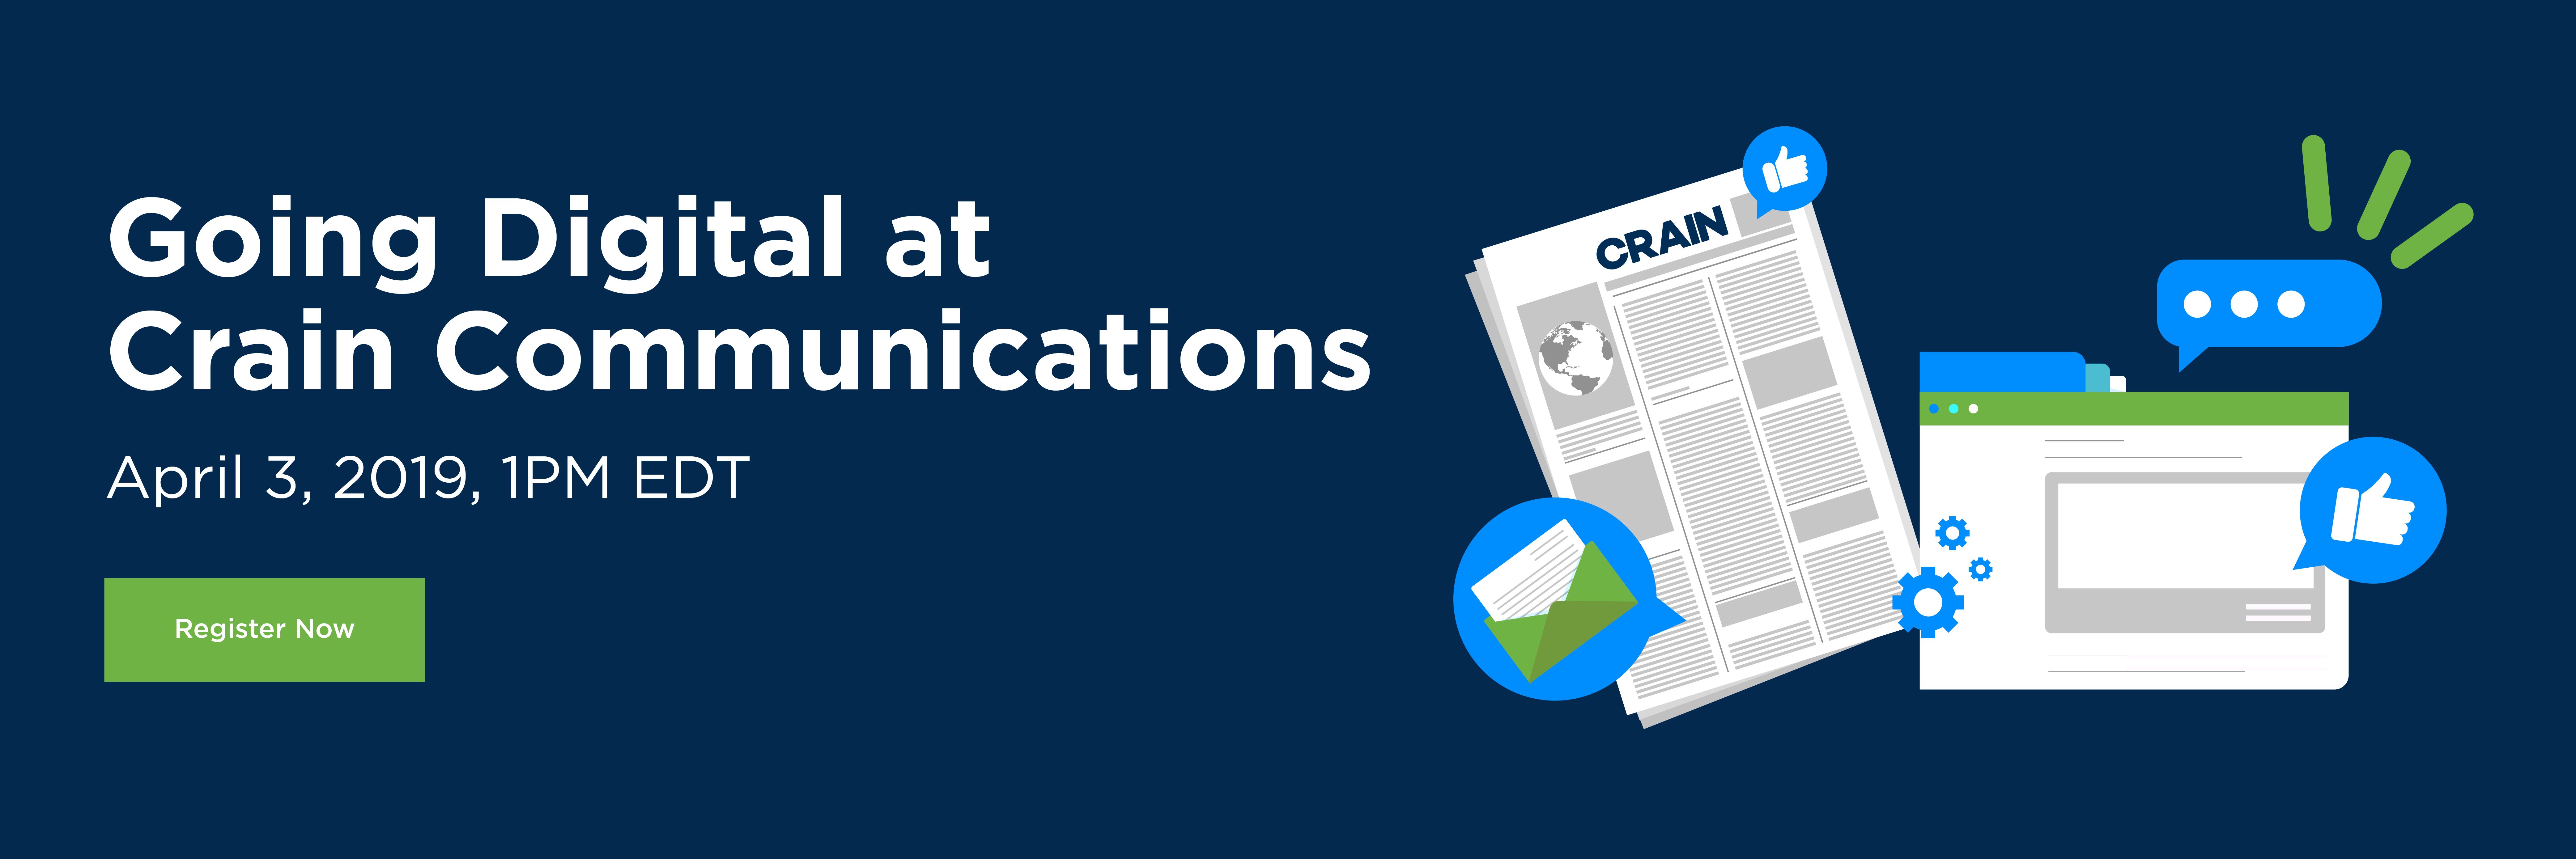 Going Digital at Crain Communication